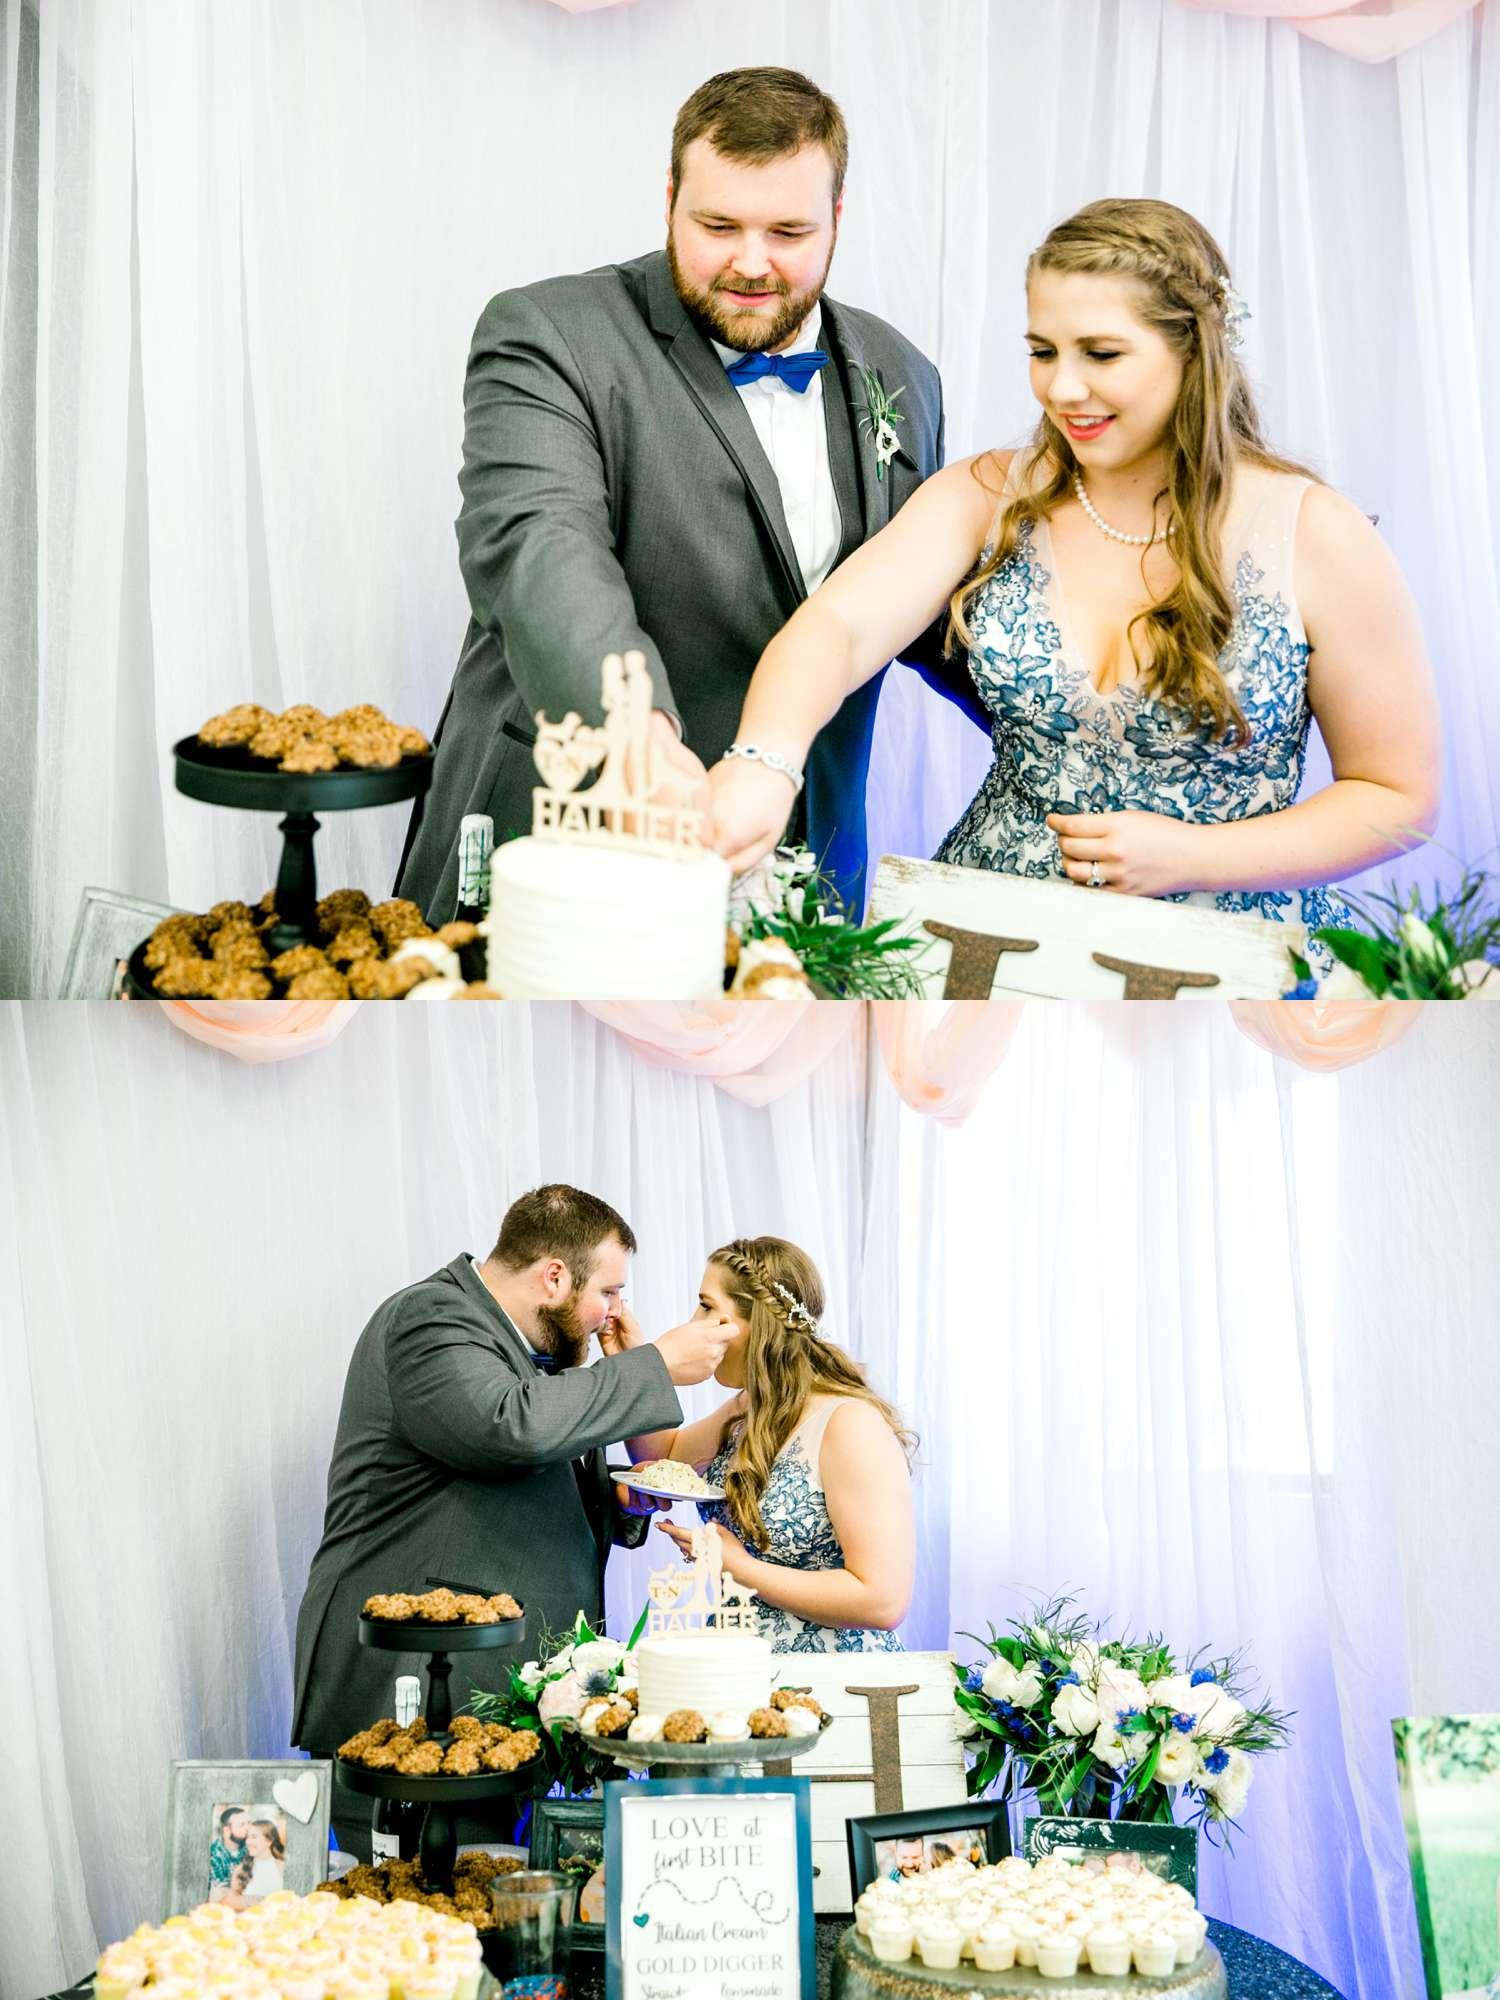 TY+NATHAN+HALLIER+ALLEEJ+WEDDING+PHOTOGRAPHER+RANSOM+CANYON_0101.jpg